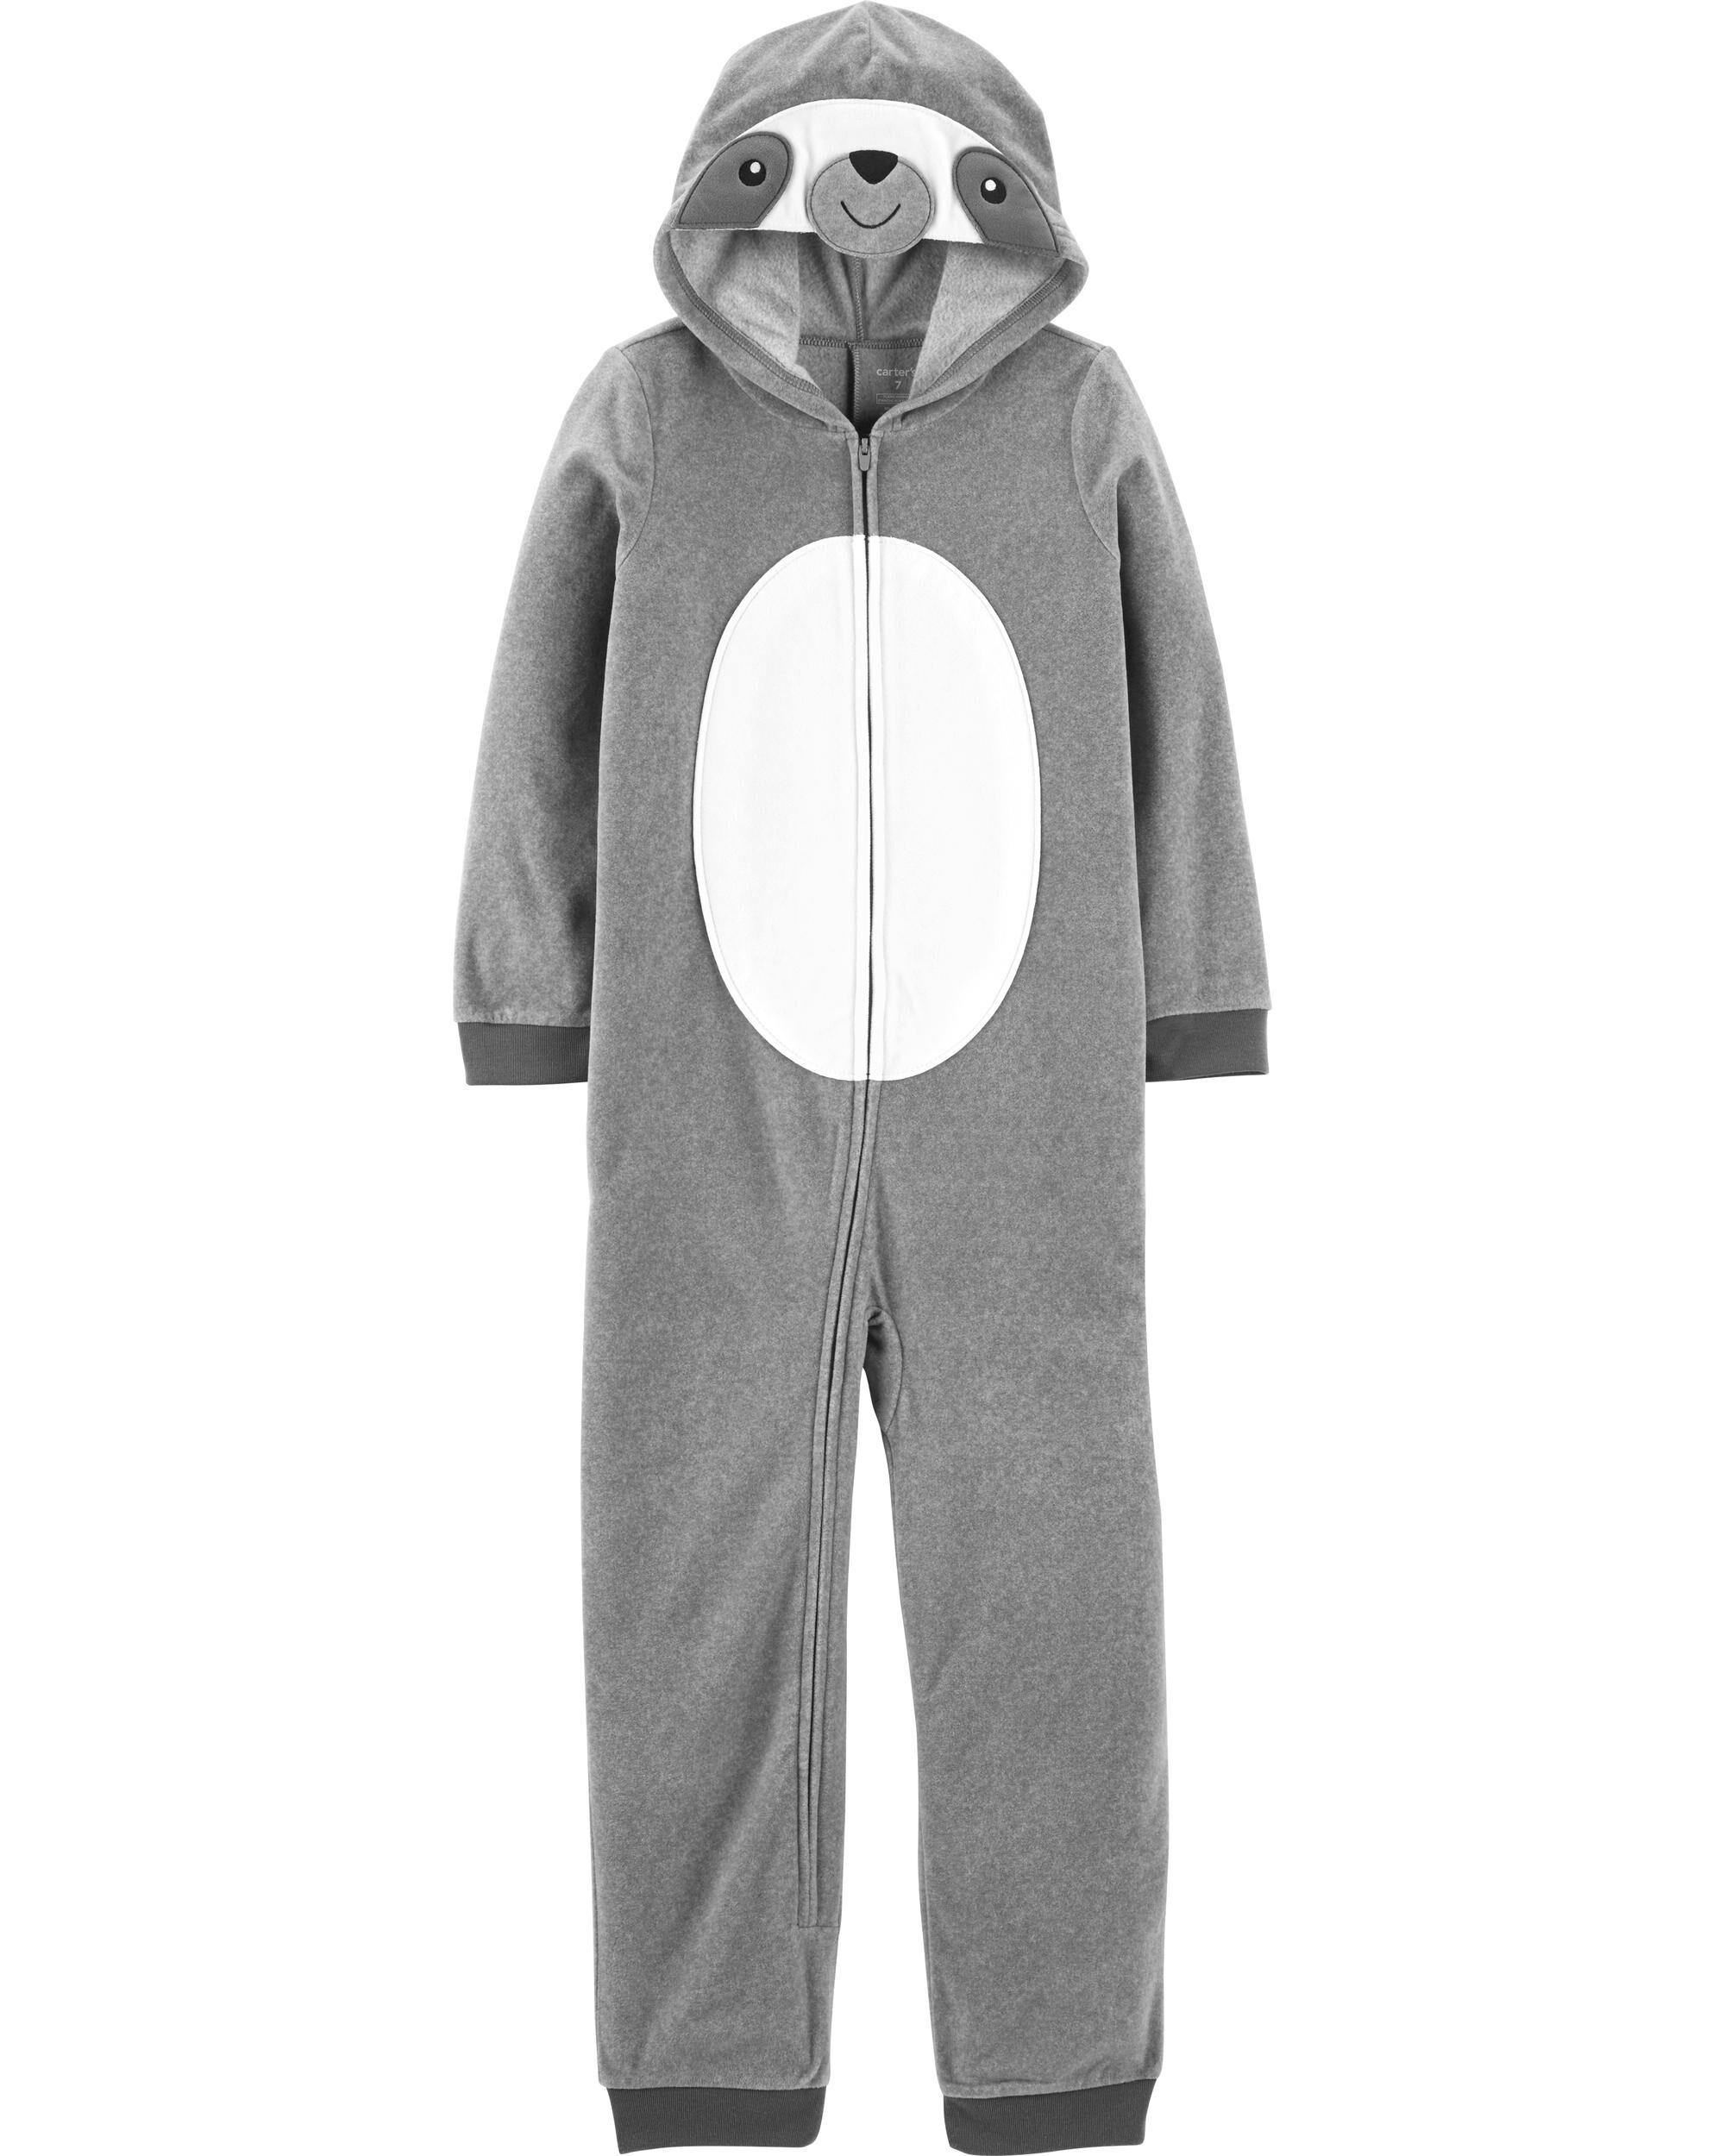 *CLEARANCE* 1-Piece Sloth Hooded Fleece Footless PJs